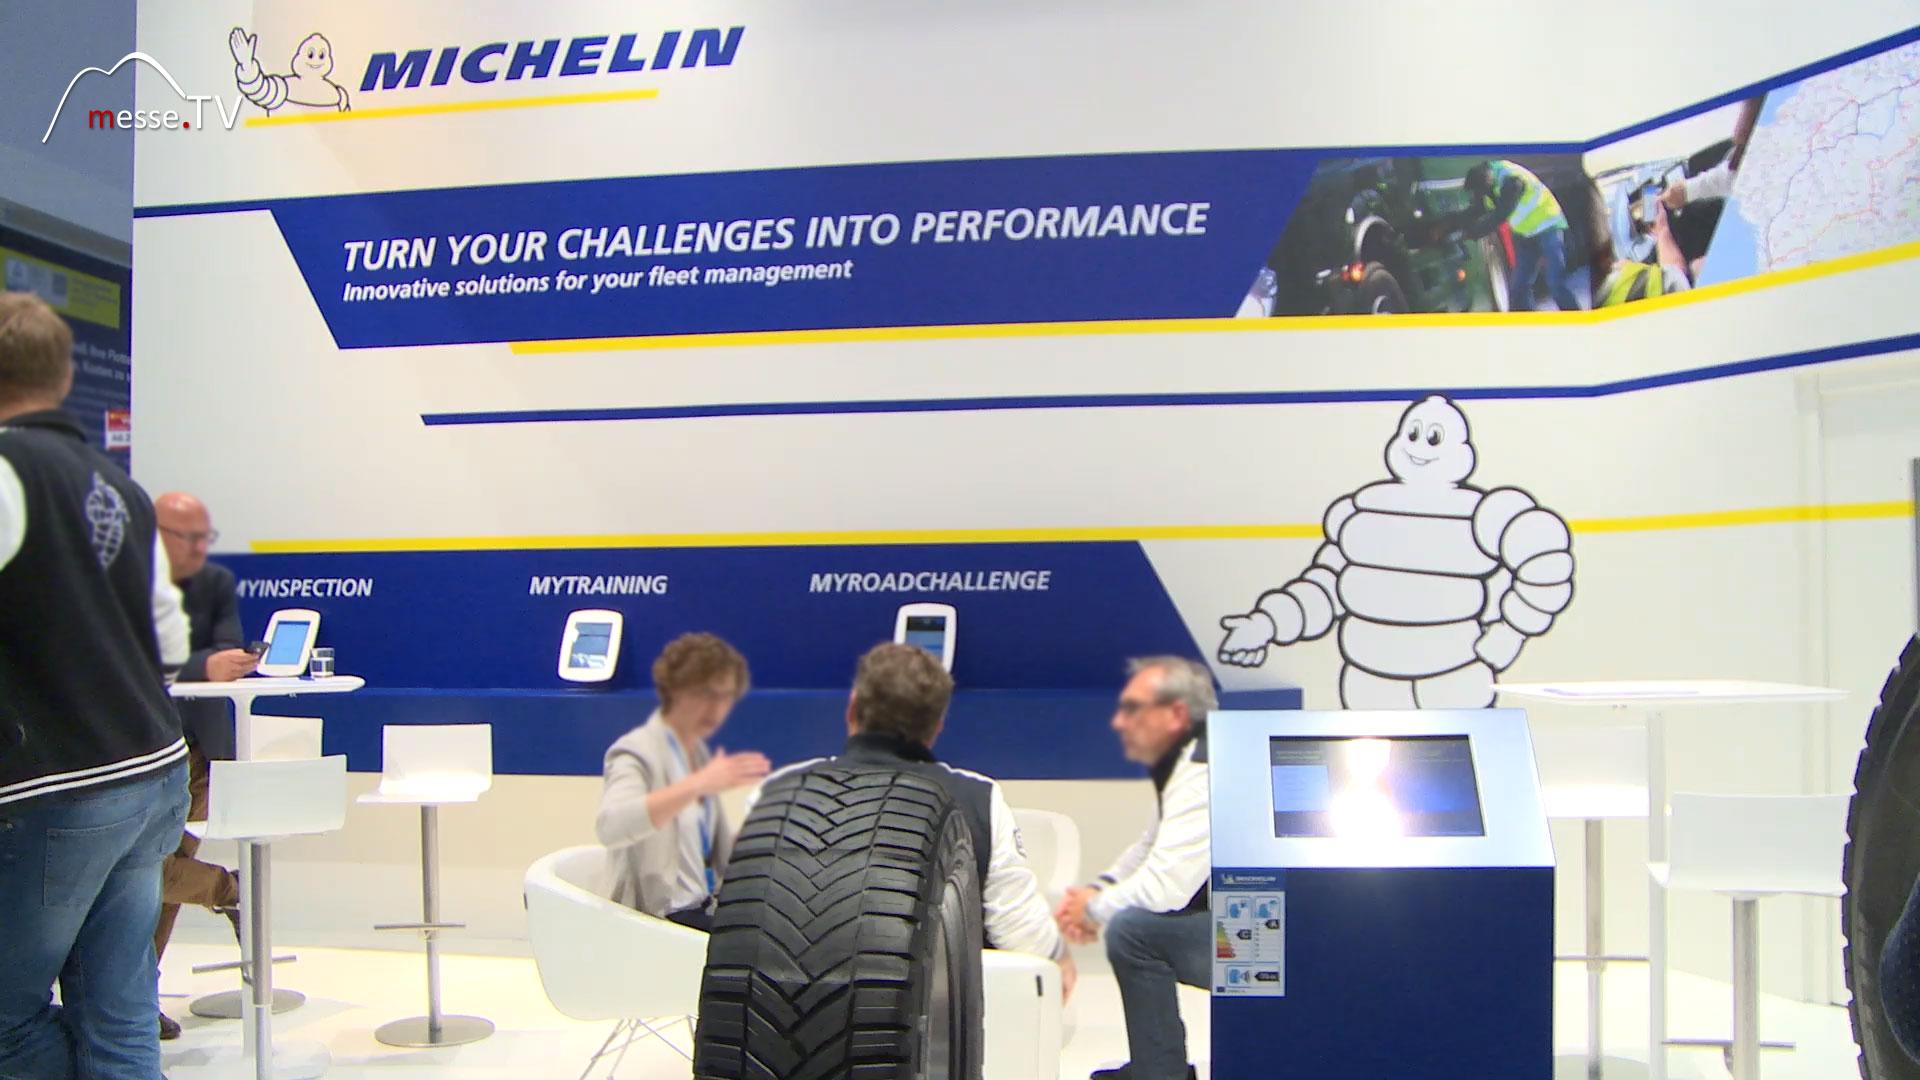 MICHELIN Messeauftritt transport logistic Messe München